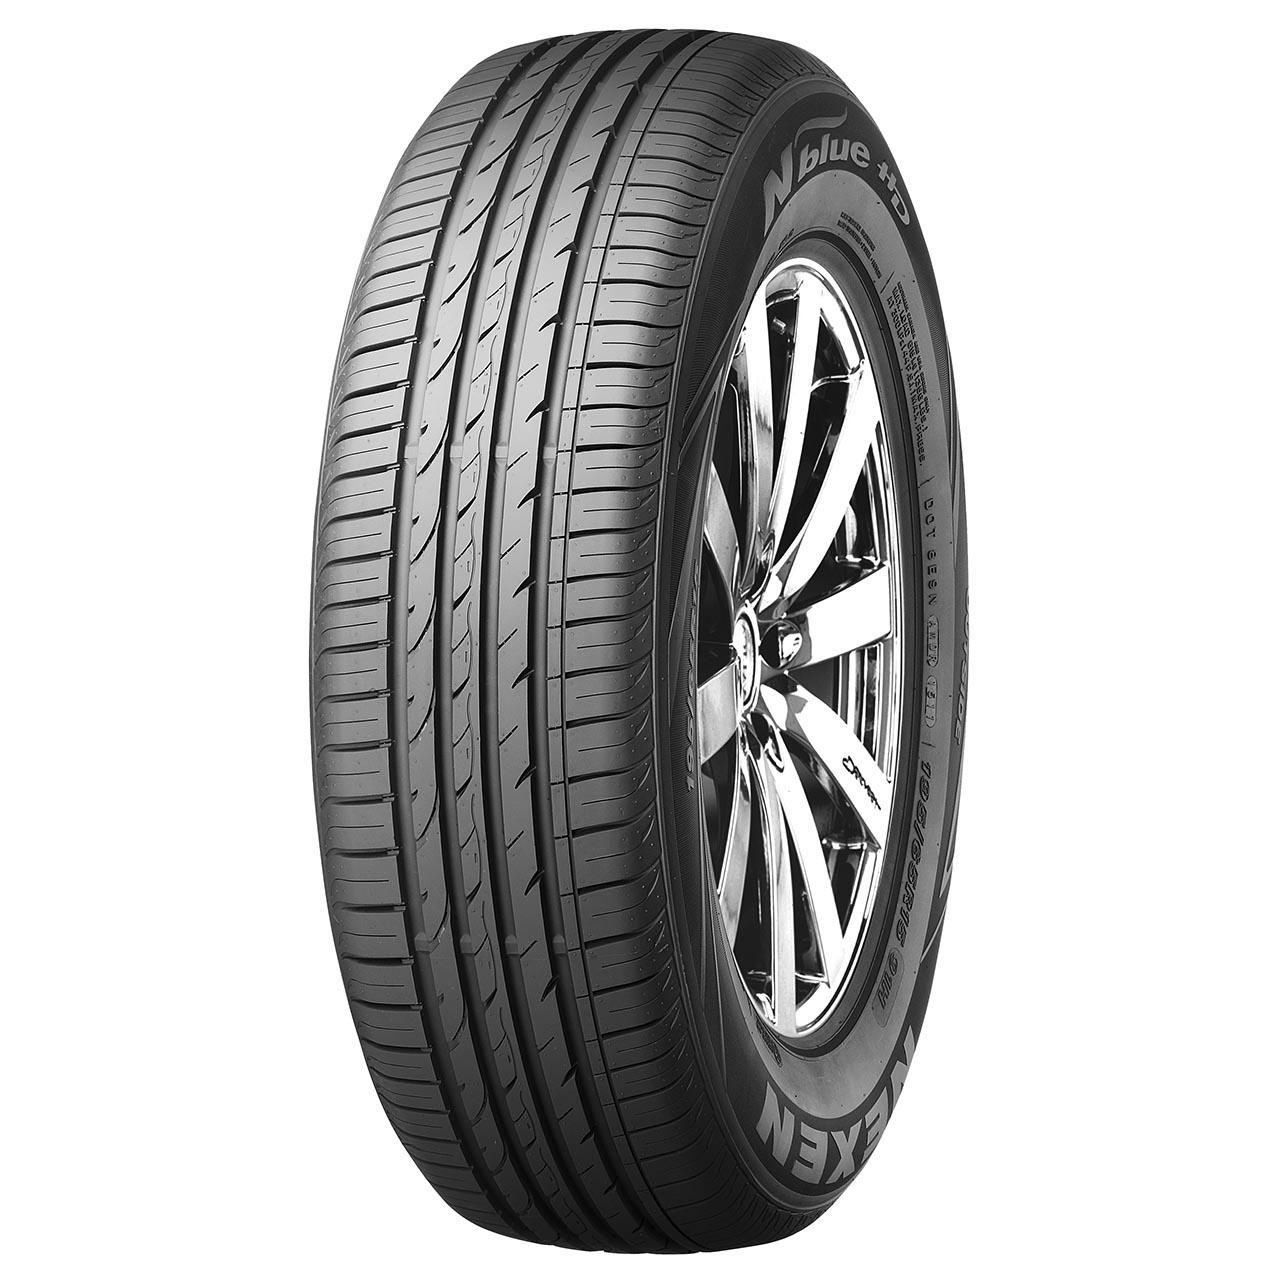 Roadstone Nblue HD 175/60R16 82H